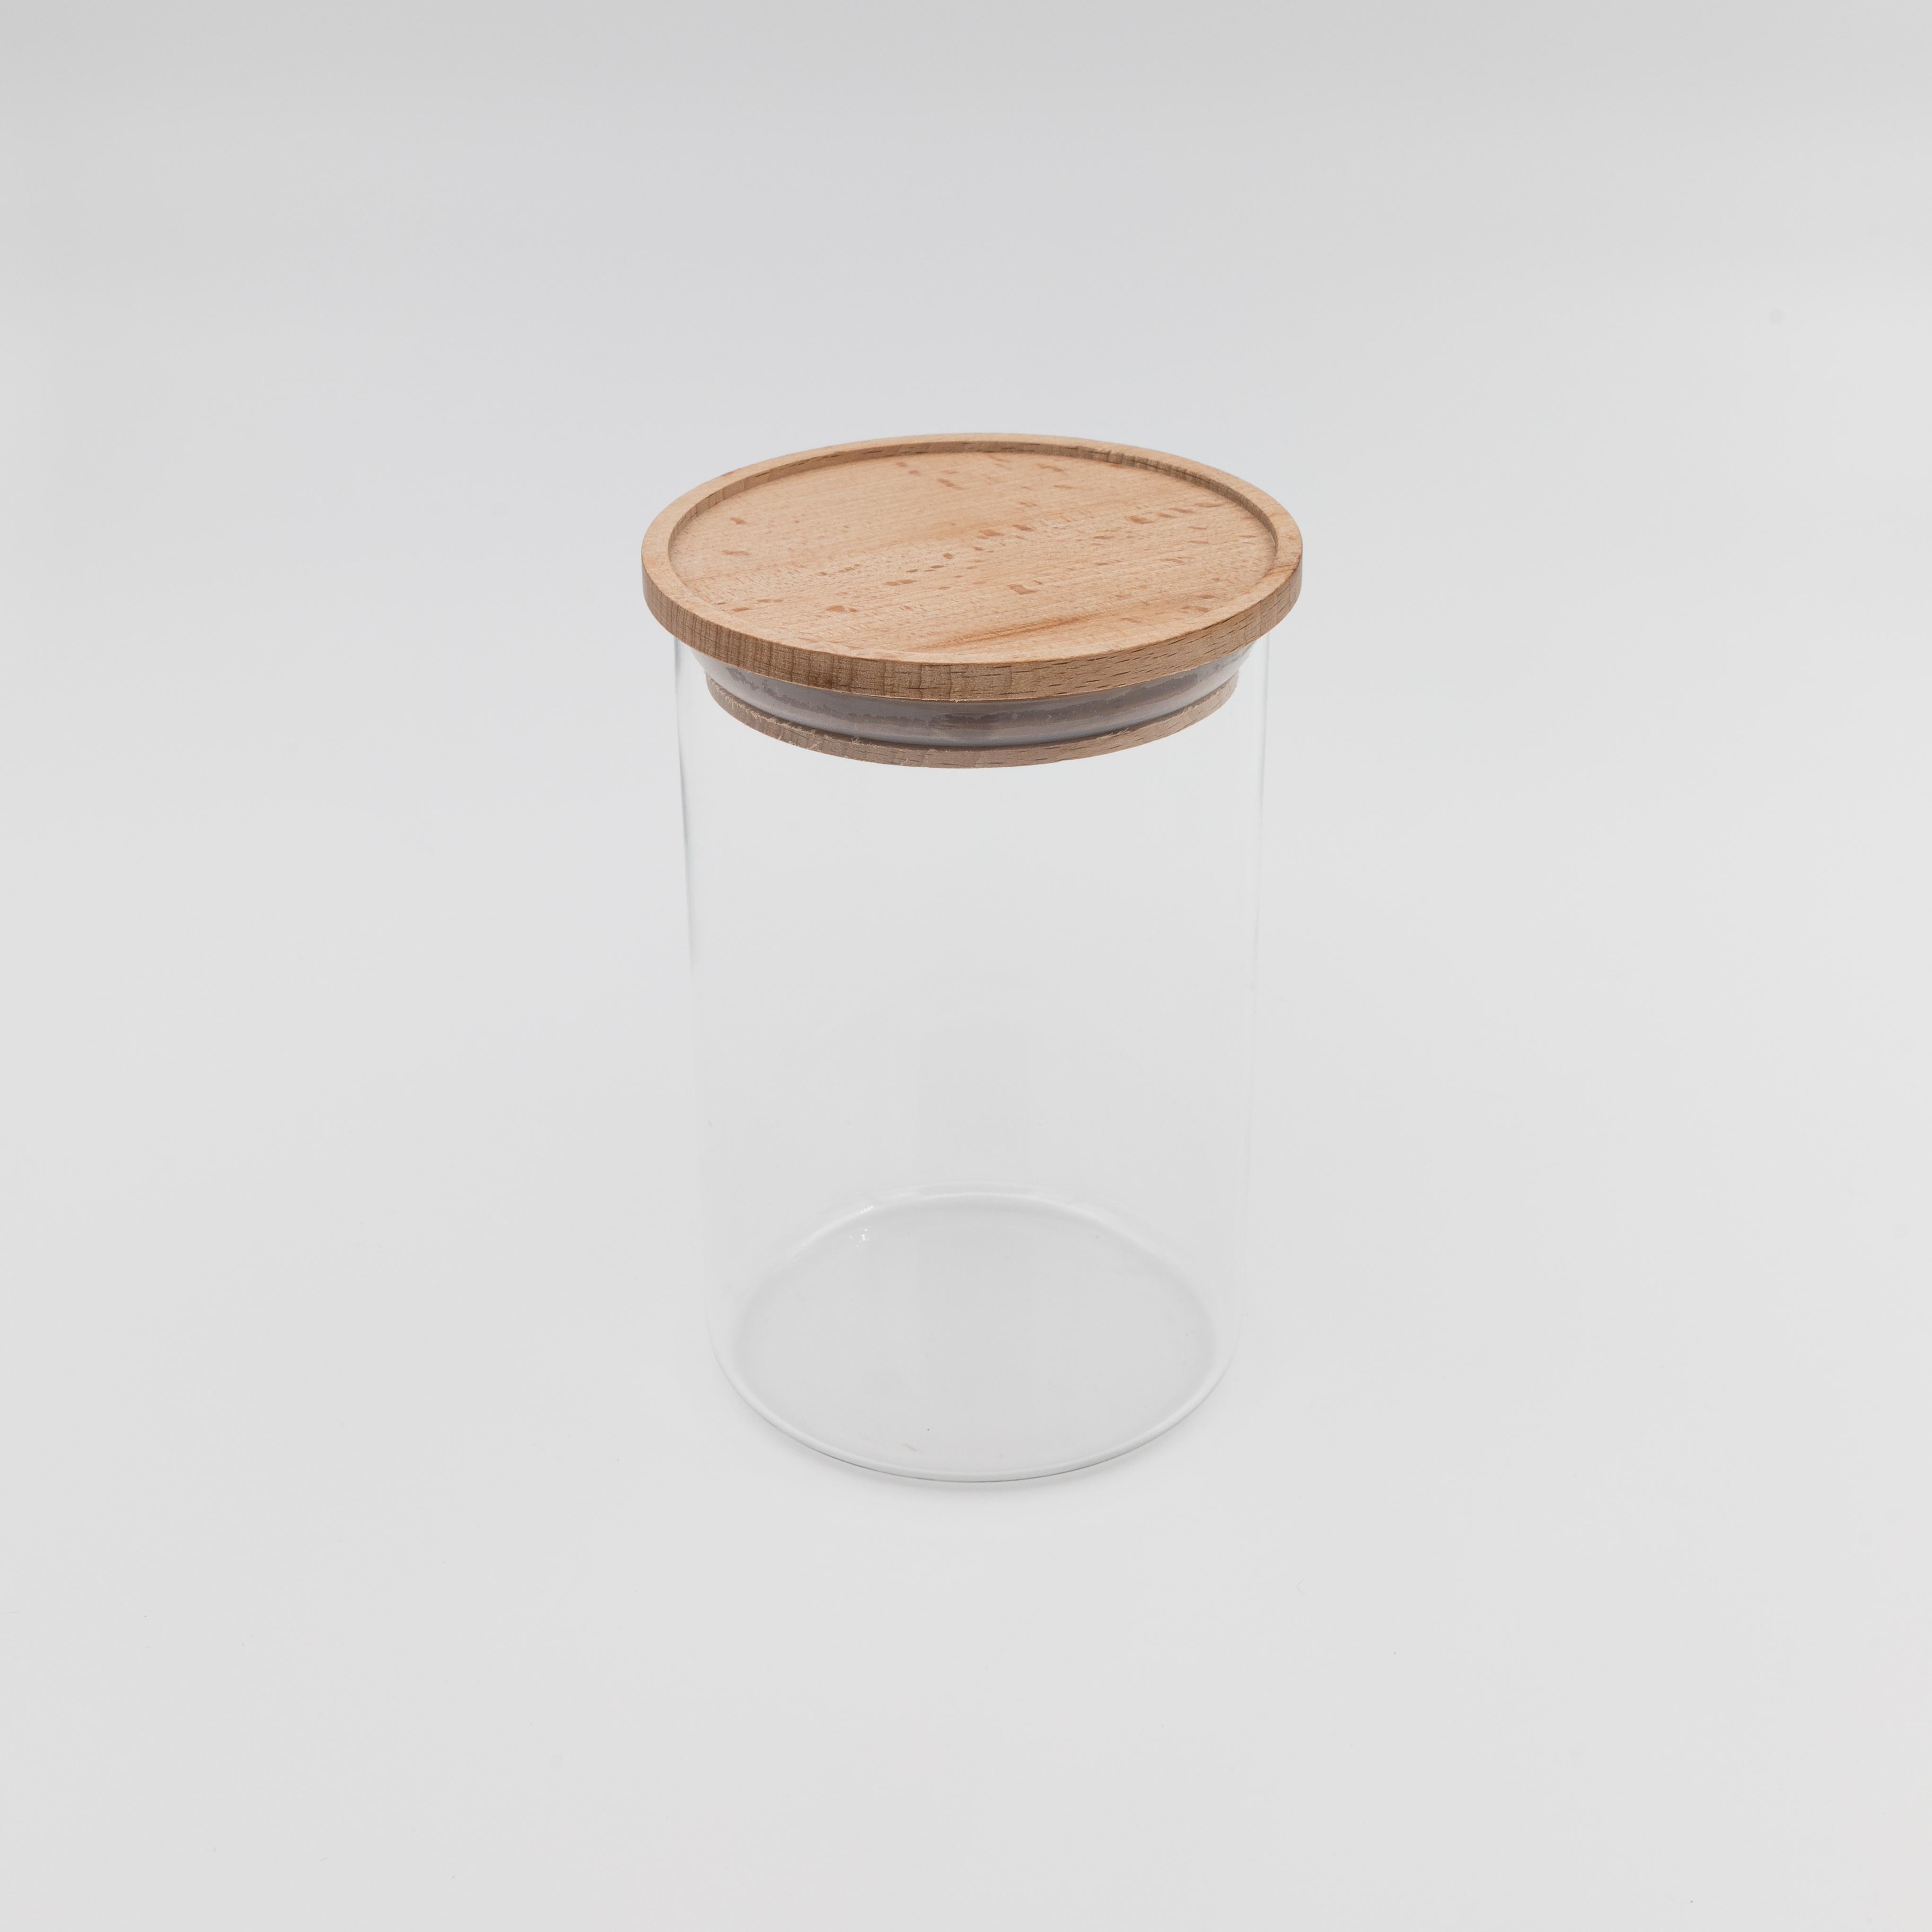 Vorratsglas mit Holzdeckel.